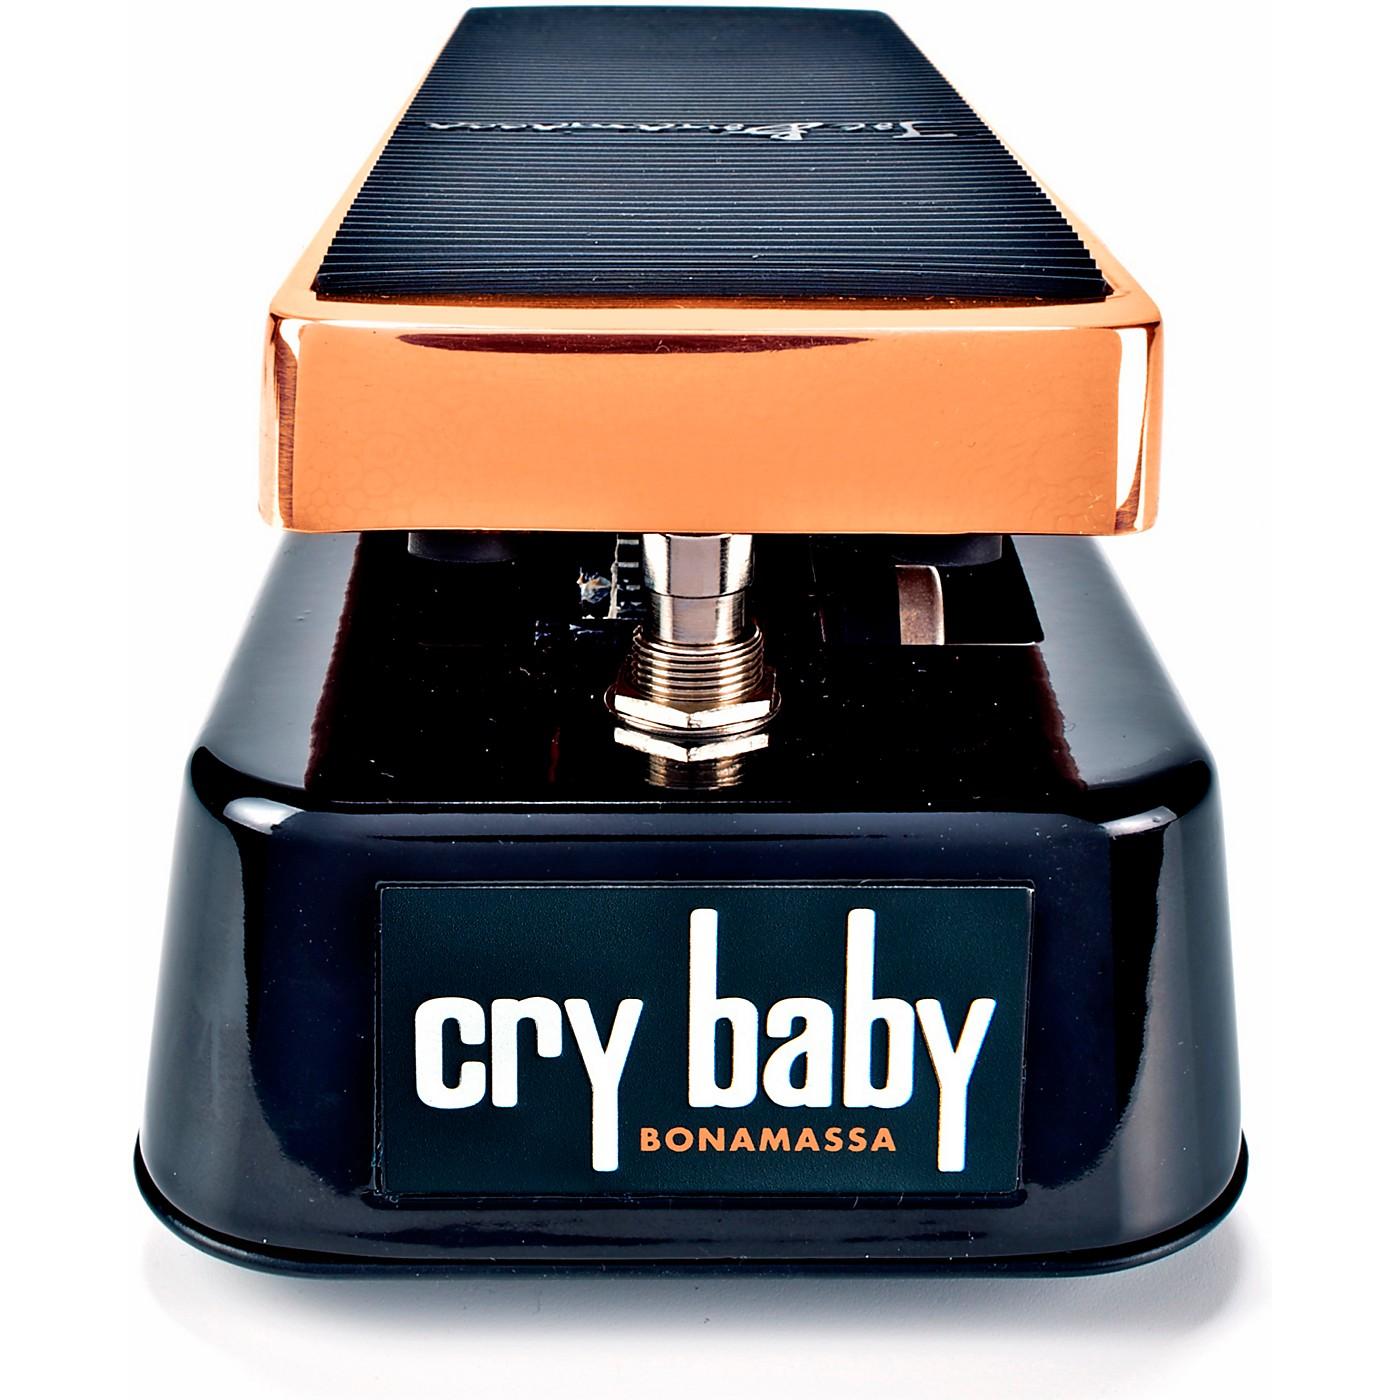 Dunlop Joe Bonamassa Signature Cry Baby Wah Guitar Effects Pedal thumbnail